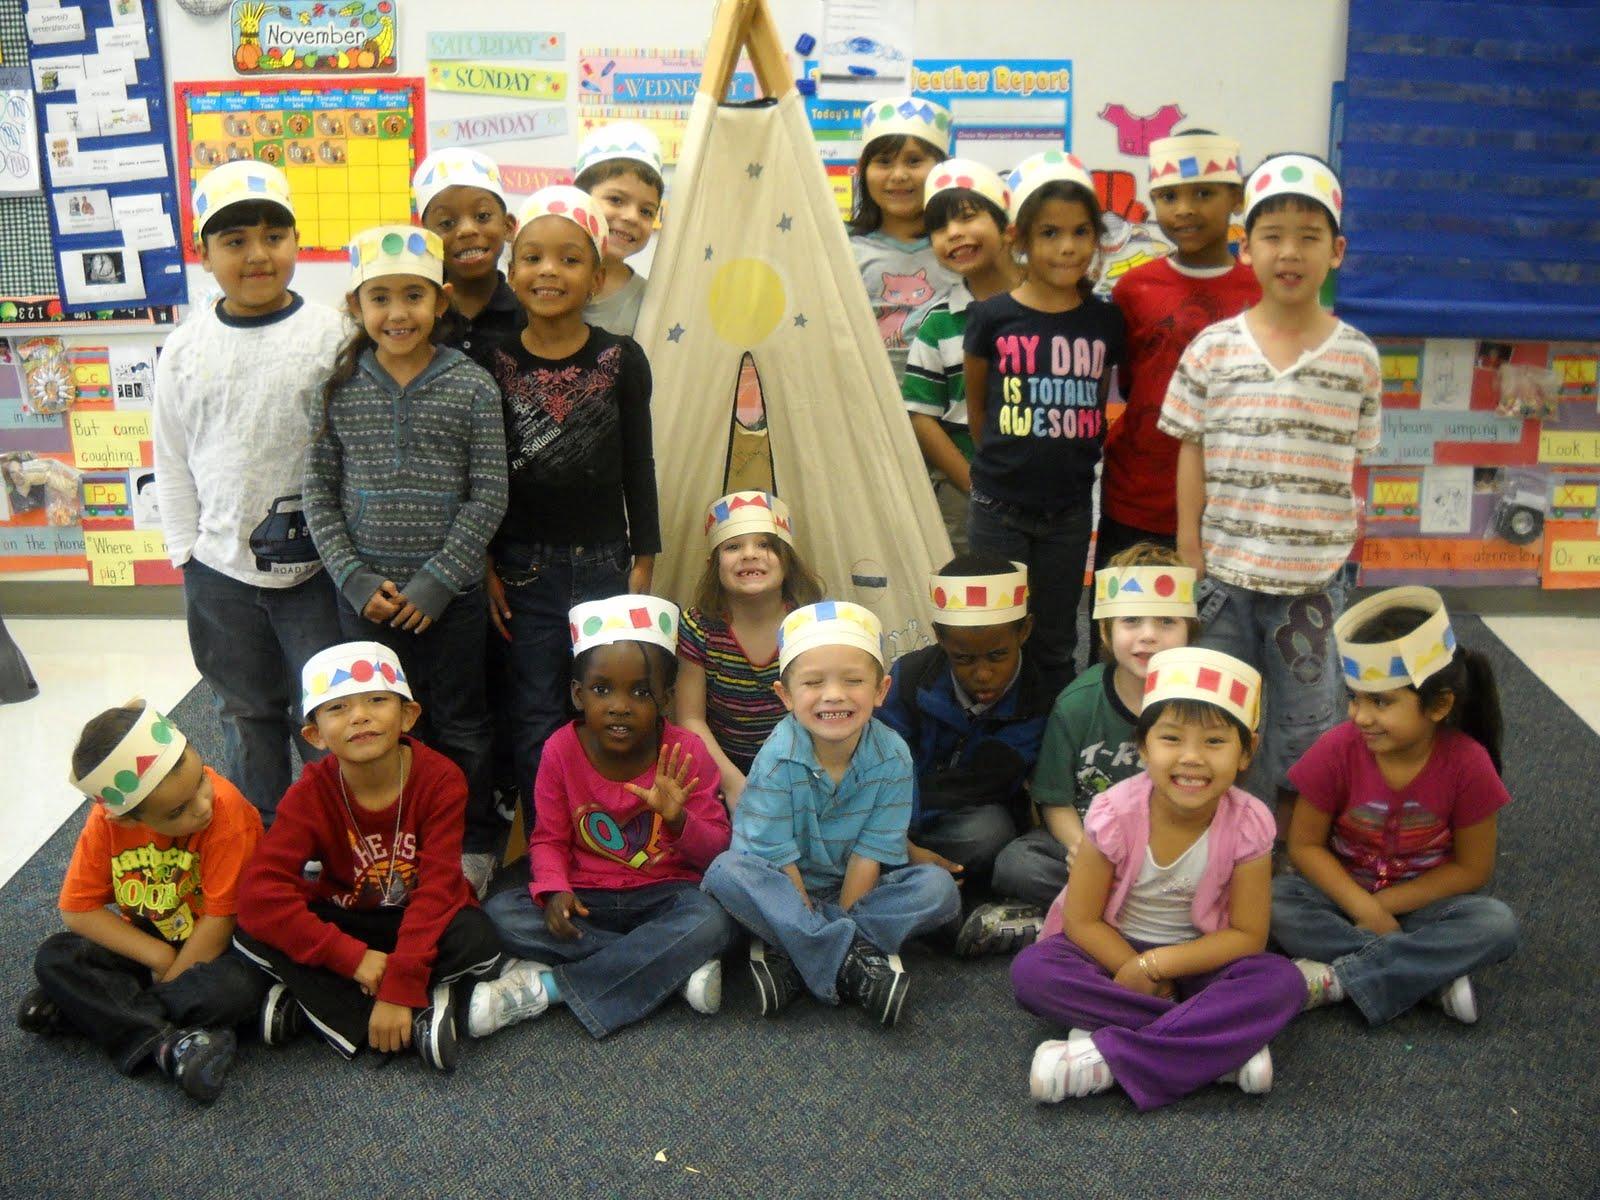 Kinder Garden: Mrs. Wood's Kindergarten Class: Pattern Headbands